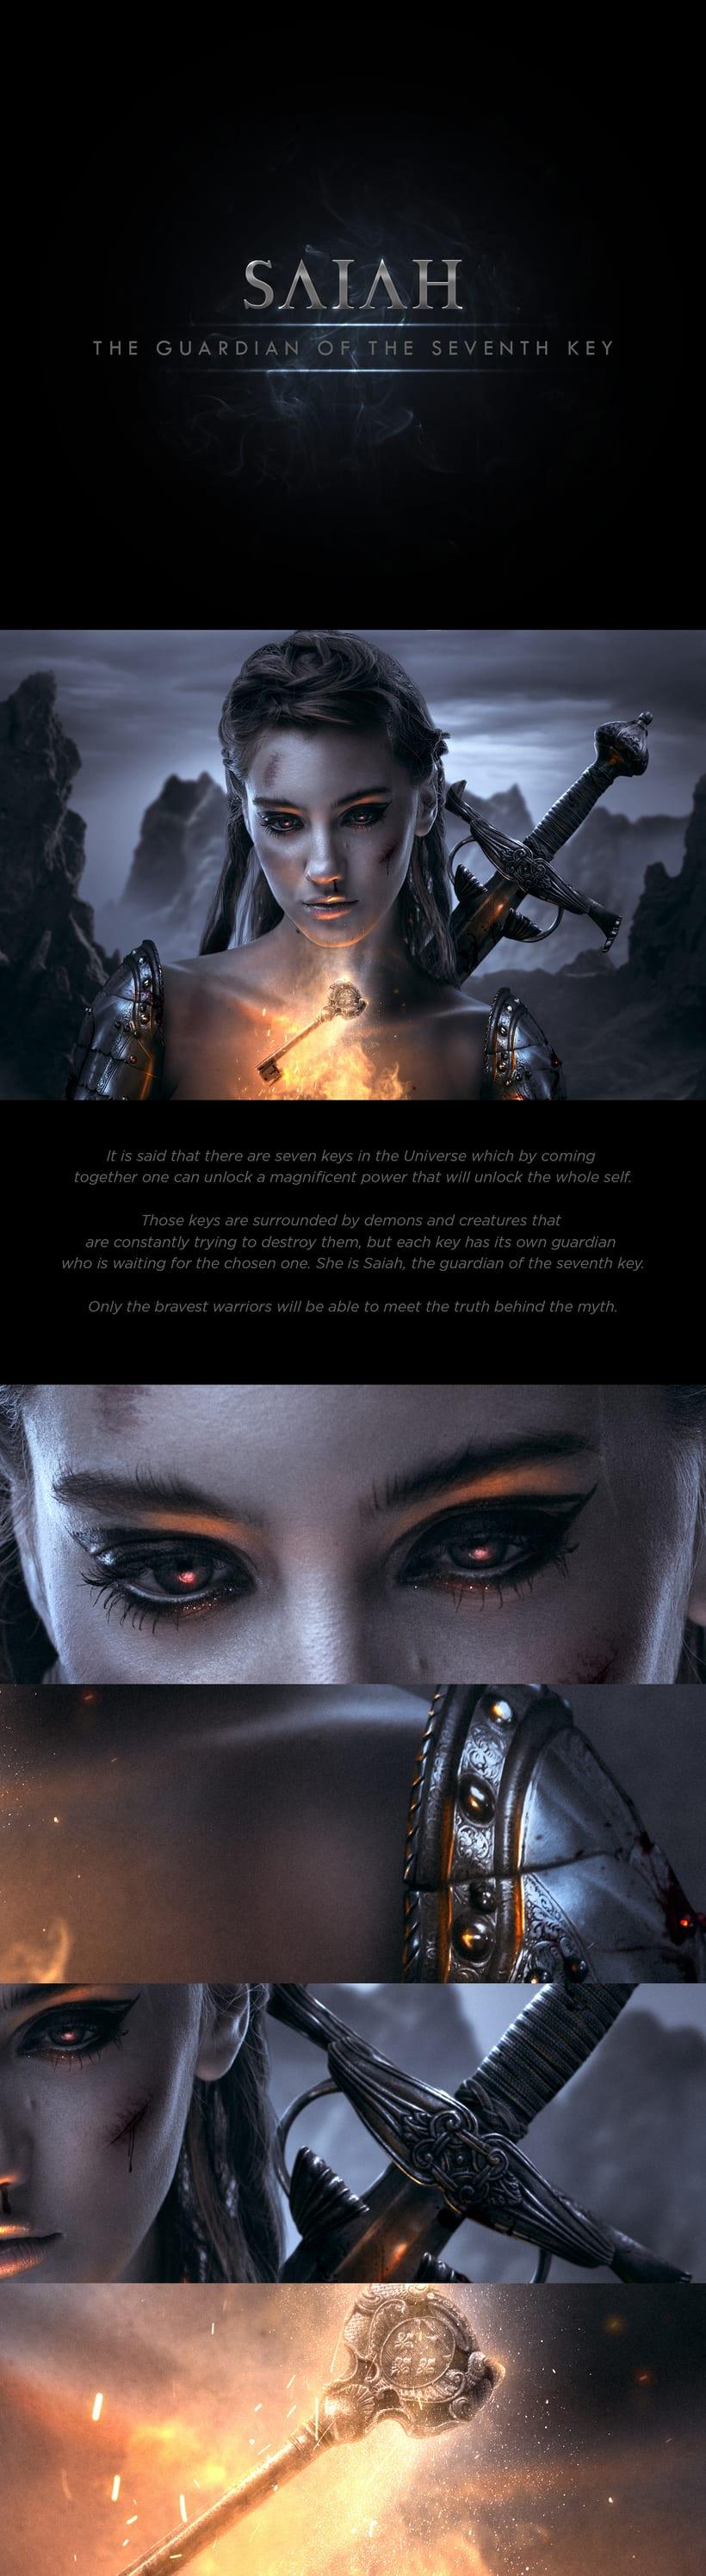 Saiah - La guardiana de la séptima llave 0